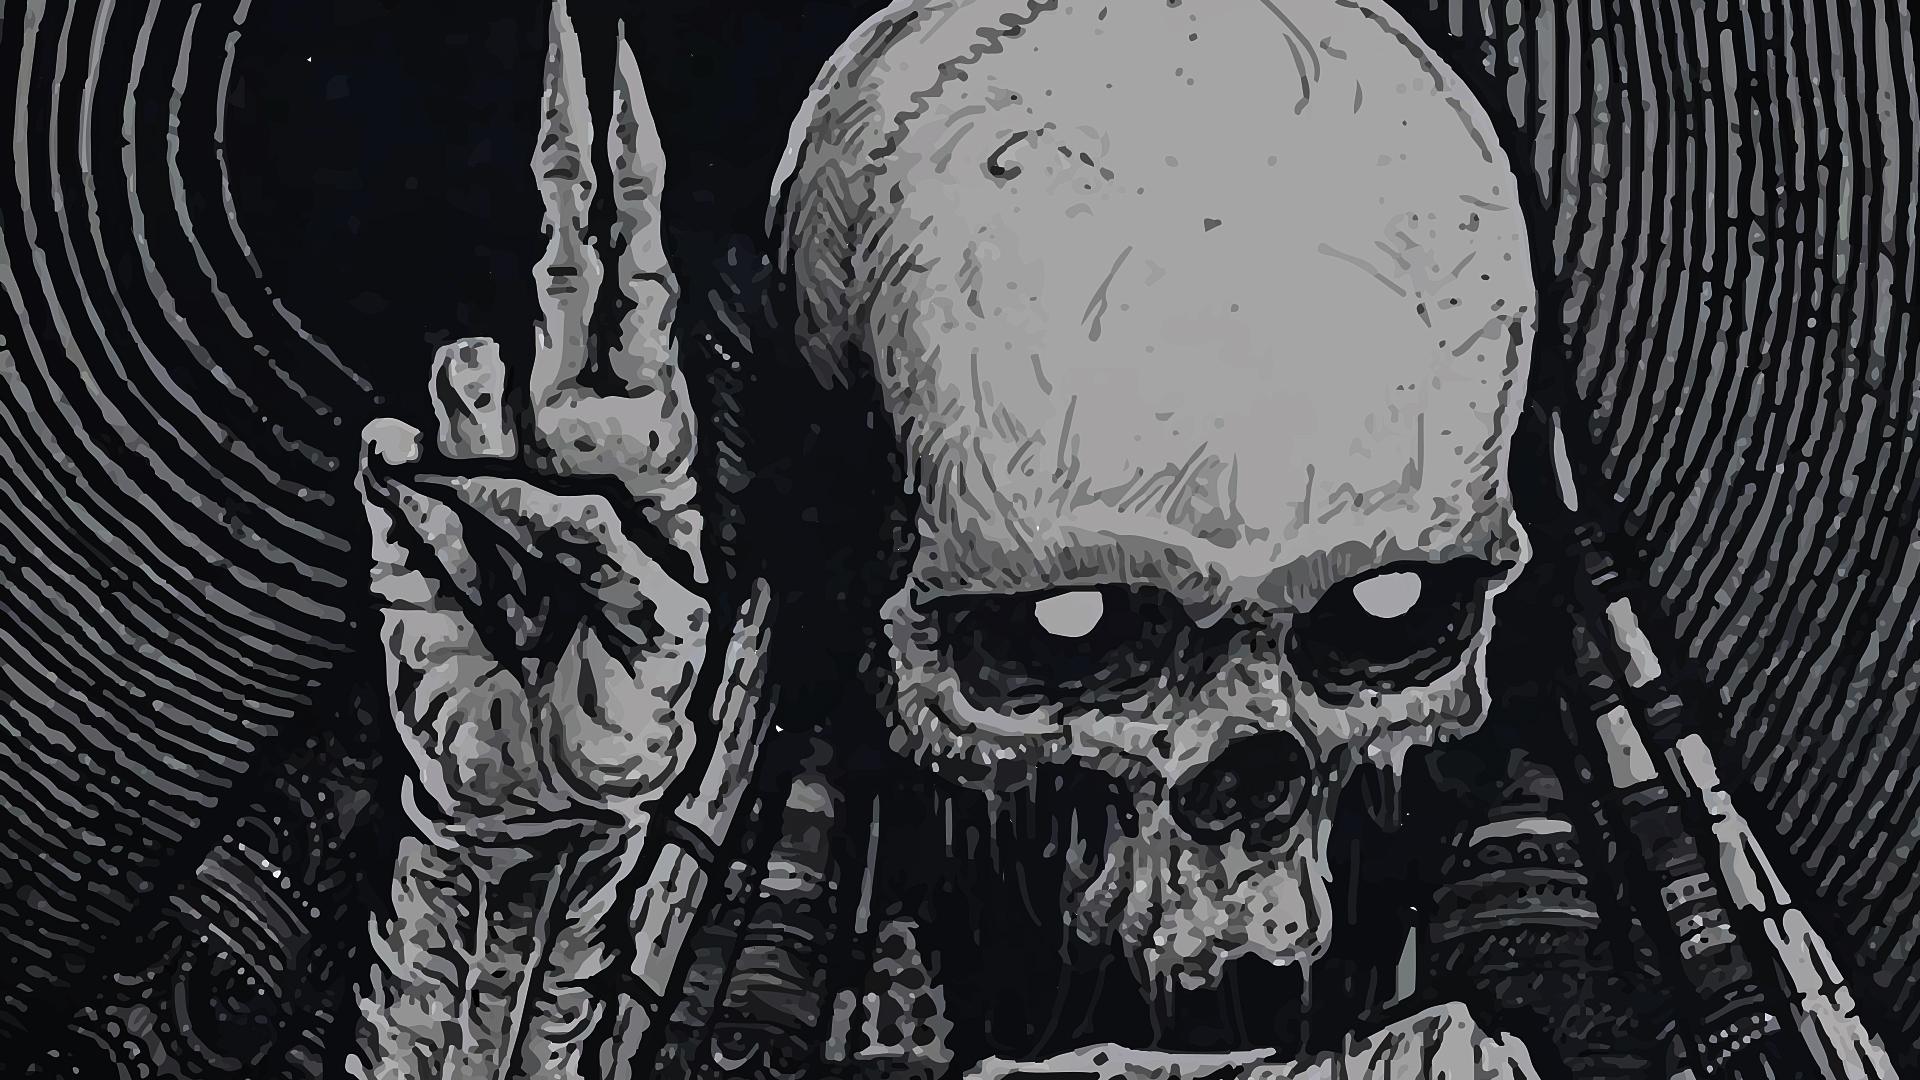 339963 Title Dark Skull Wallpaper Black Metal 1920x1080 Download Hd Wallpaper Wallpapertip